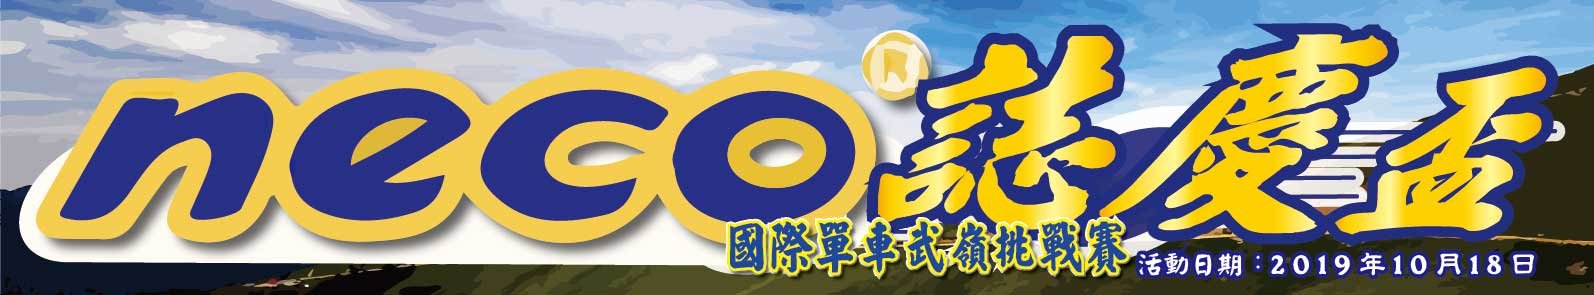 2019 NECO誌慶盃台中週國際單車武嶺挑戰賽